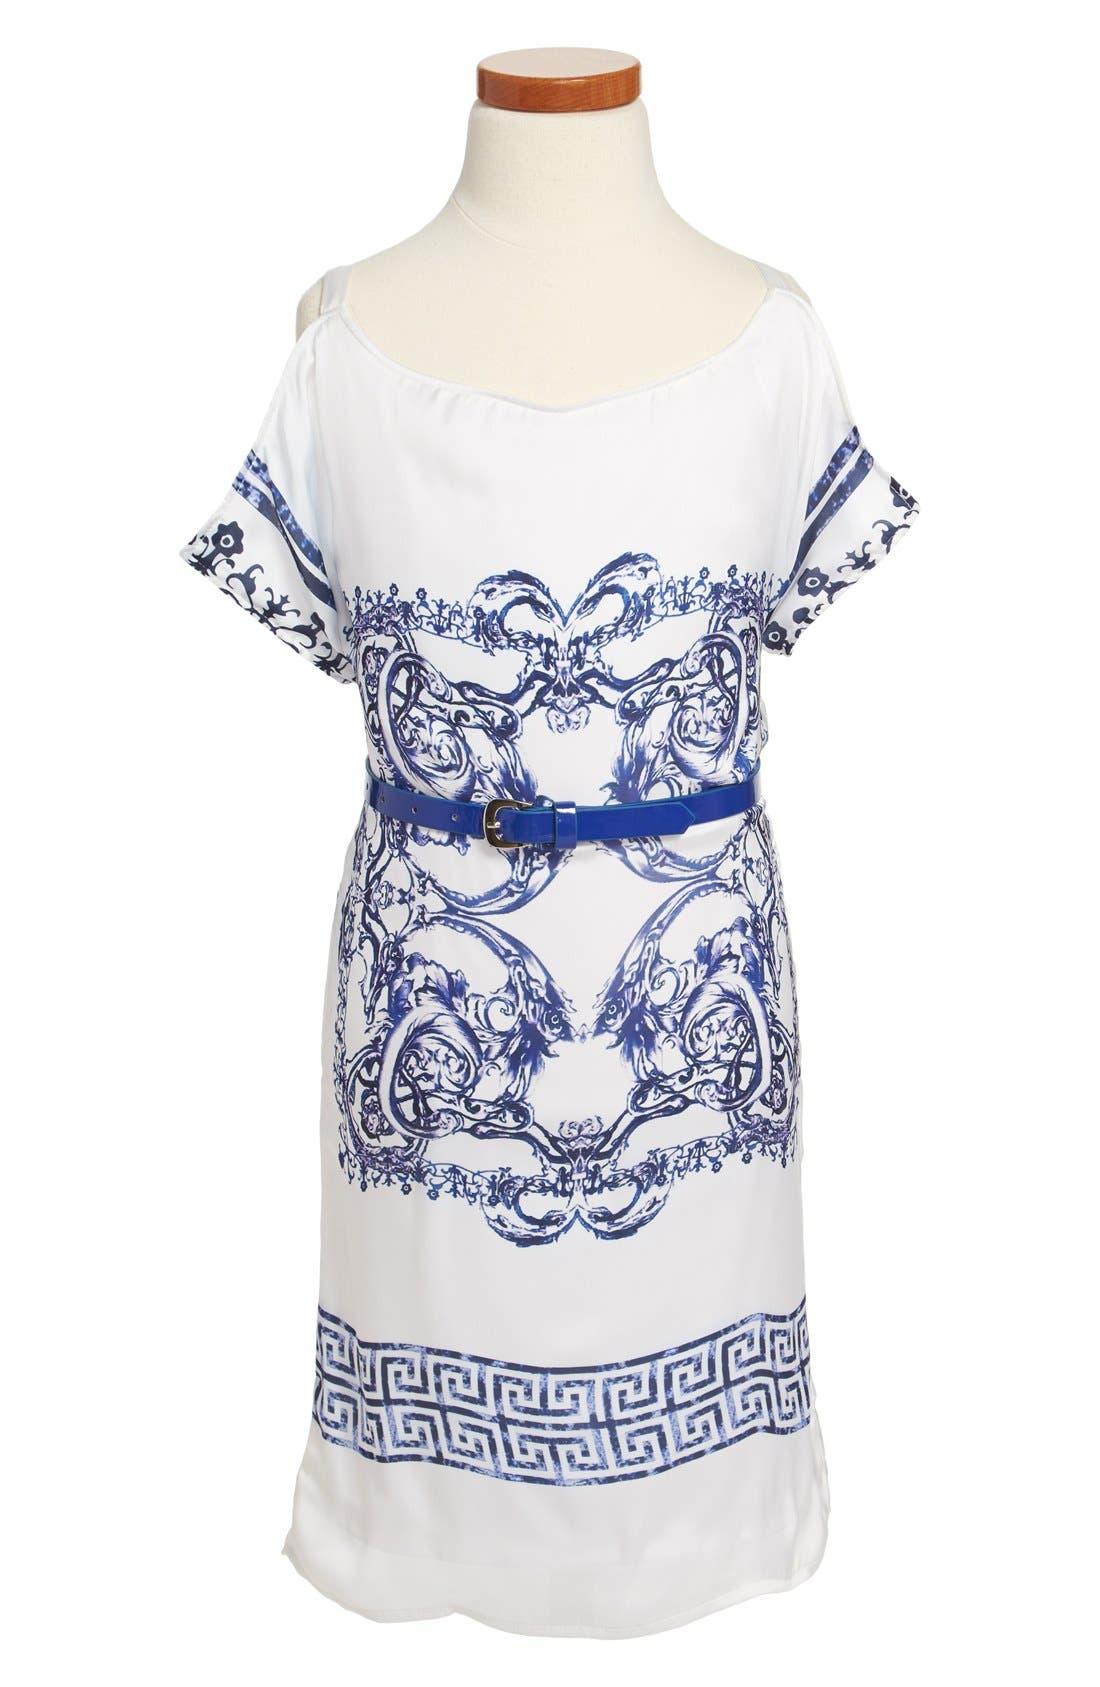 Alternate Image 1 Selected - Laundry by Shelli Segal Print Dress (Big Girls)